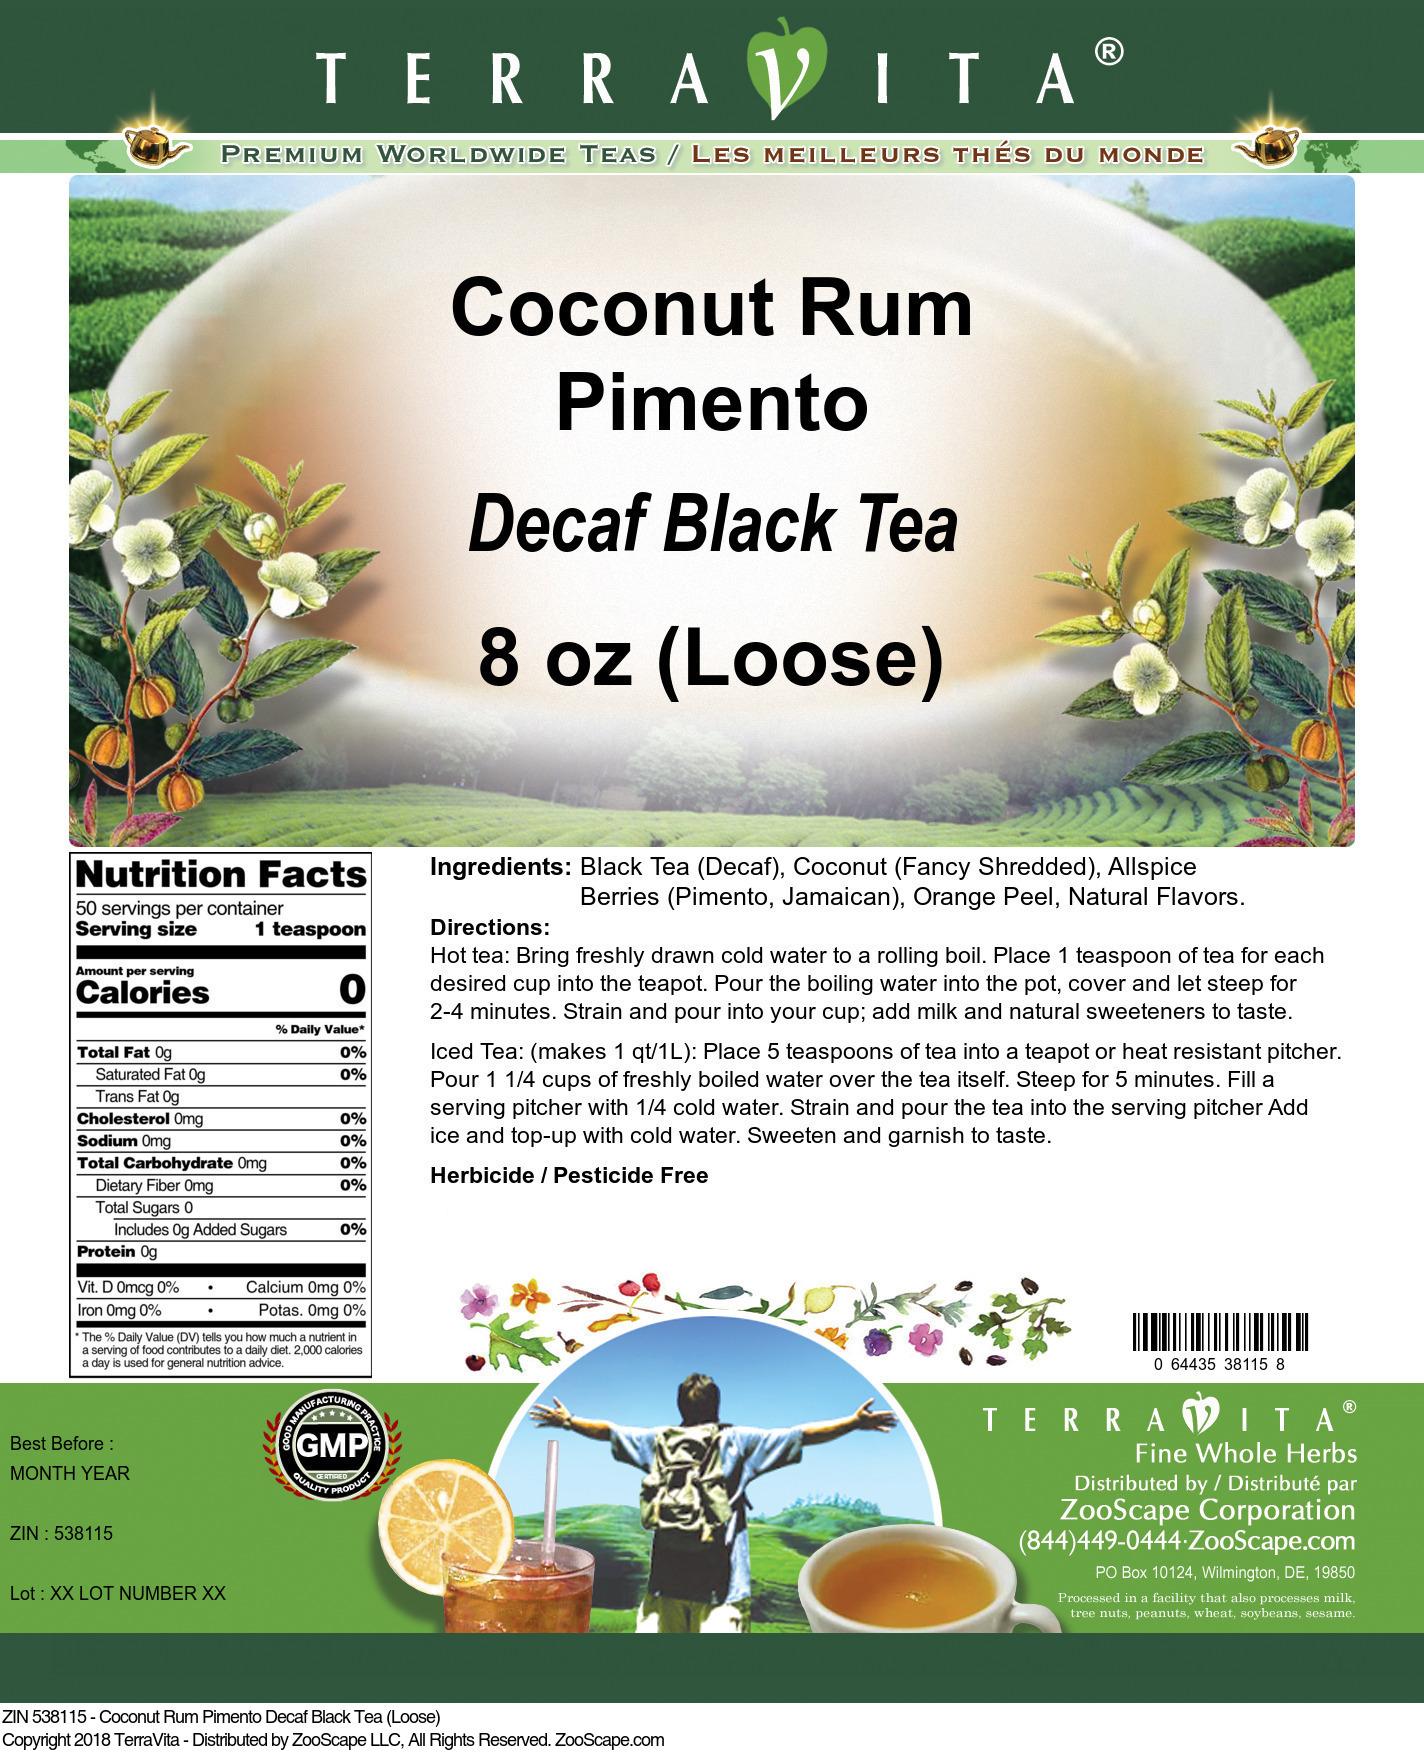 Coconut Rum Pimento Decaf Black Tea (Loose)